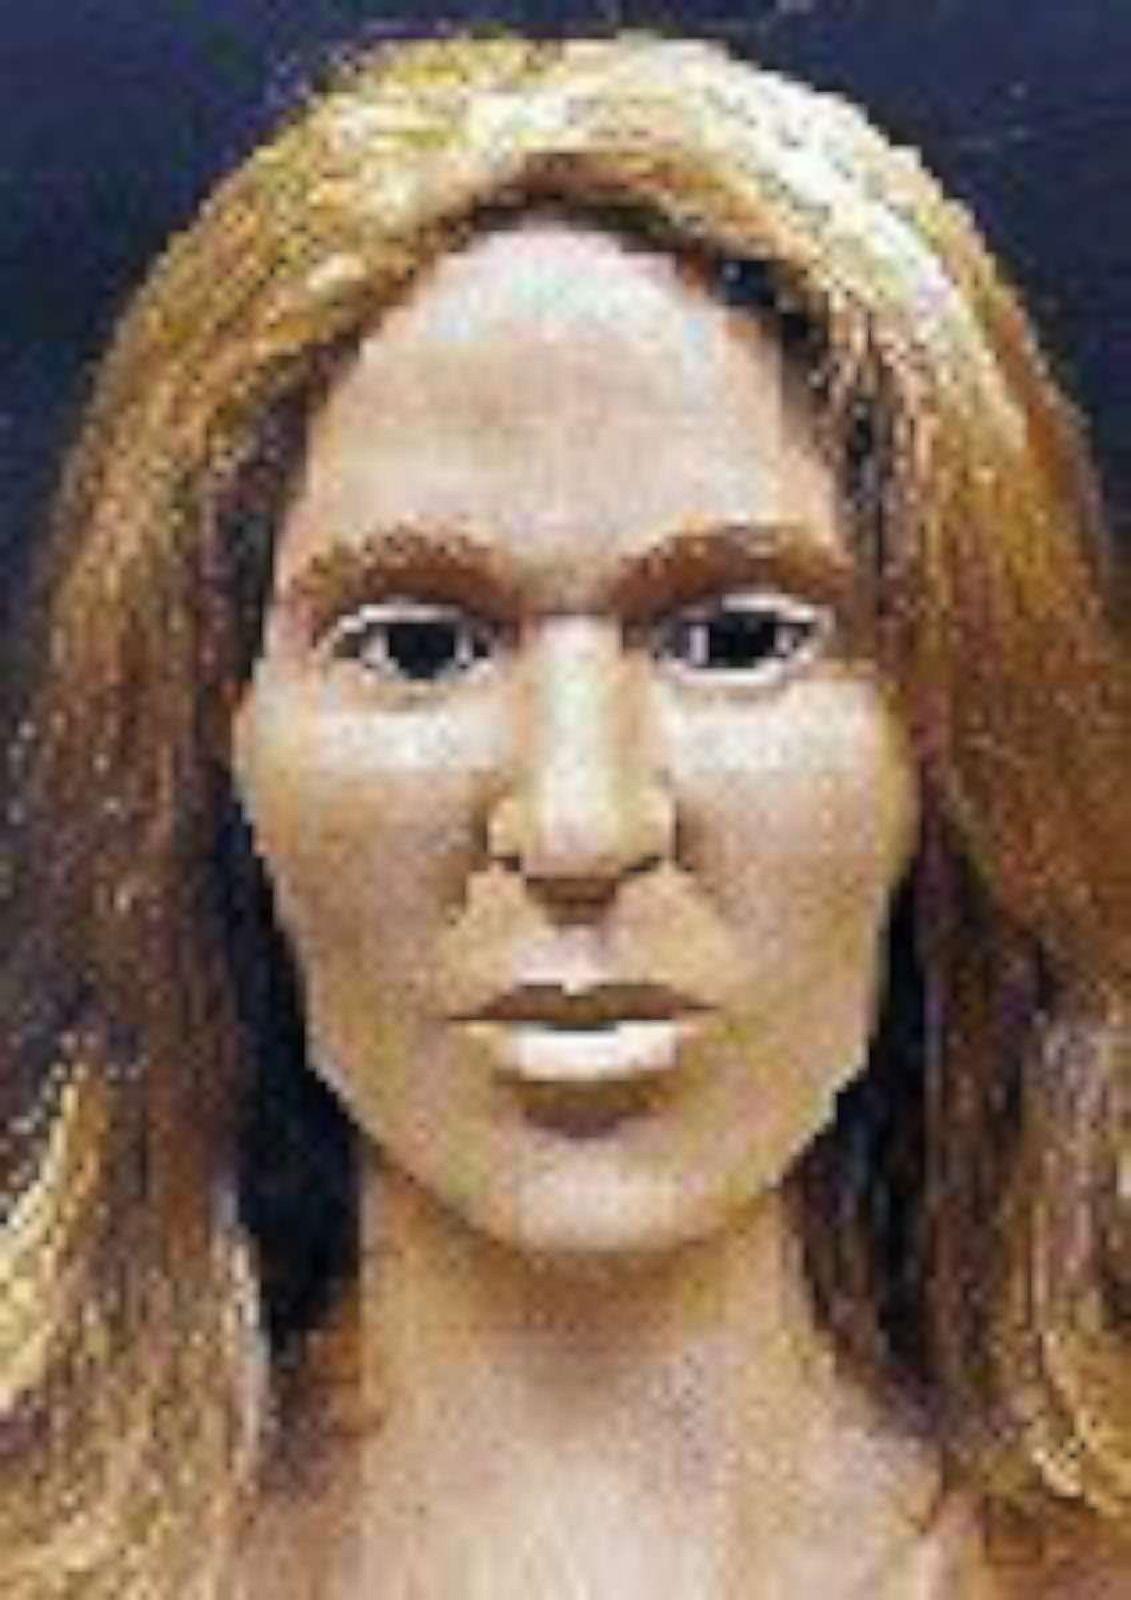 How a California Jane Doe found dead in 1991 was identified as